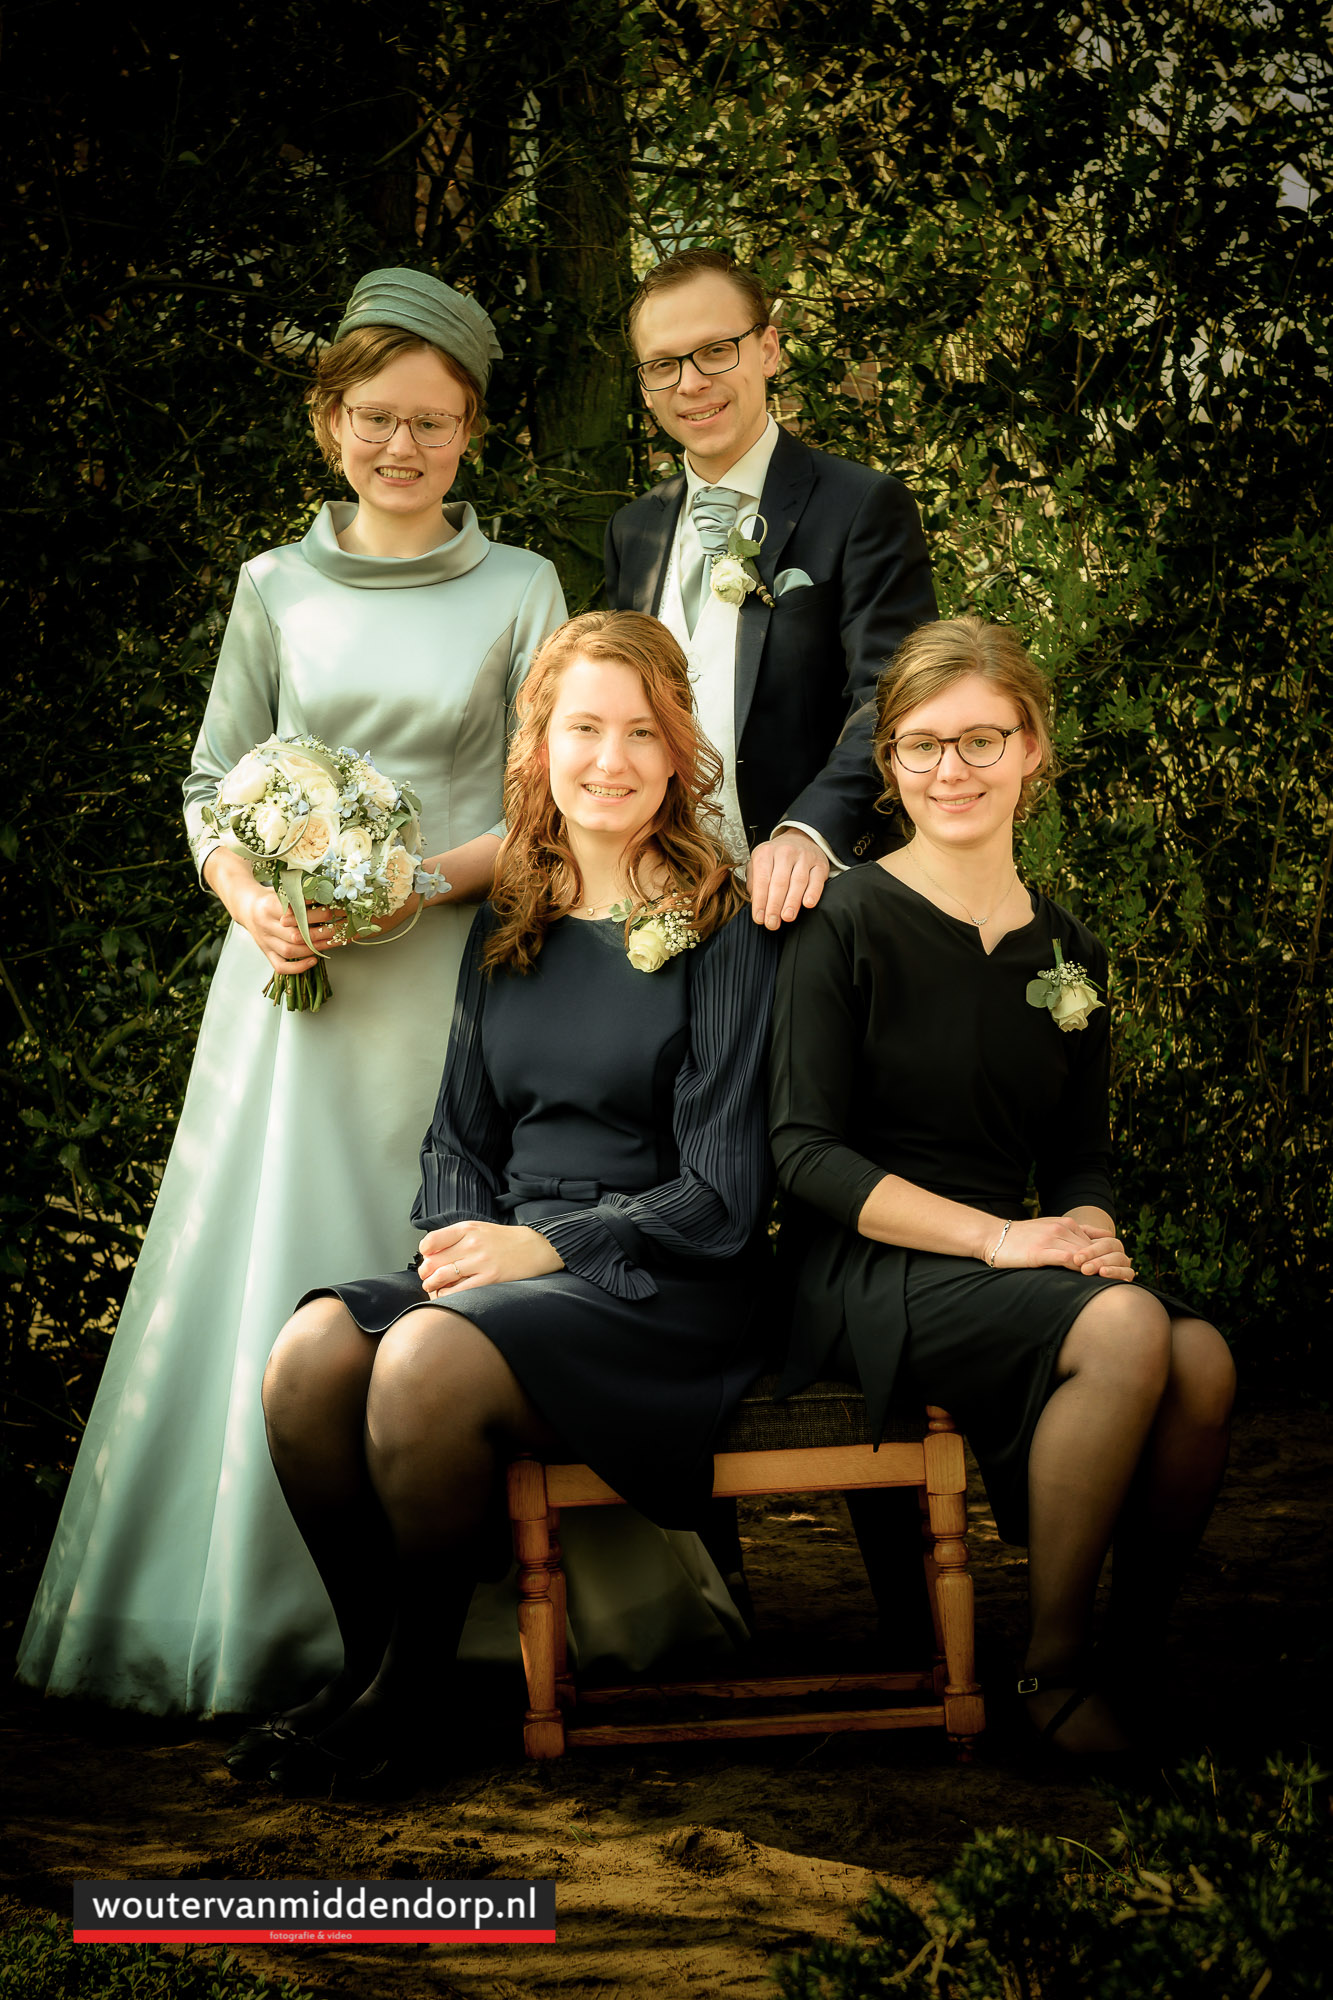 bruidsfotografie Wouter van Middendorp Uddel Ede-20